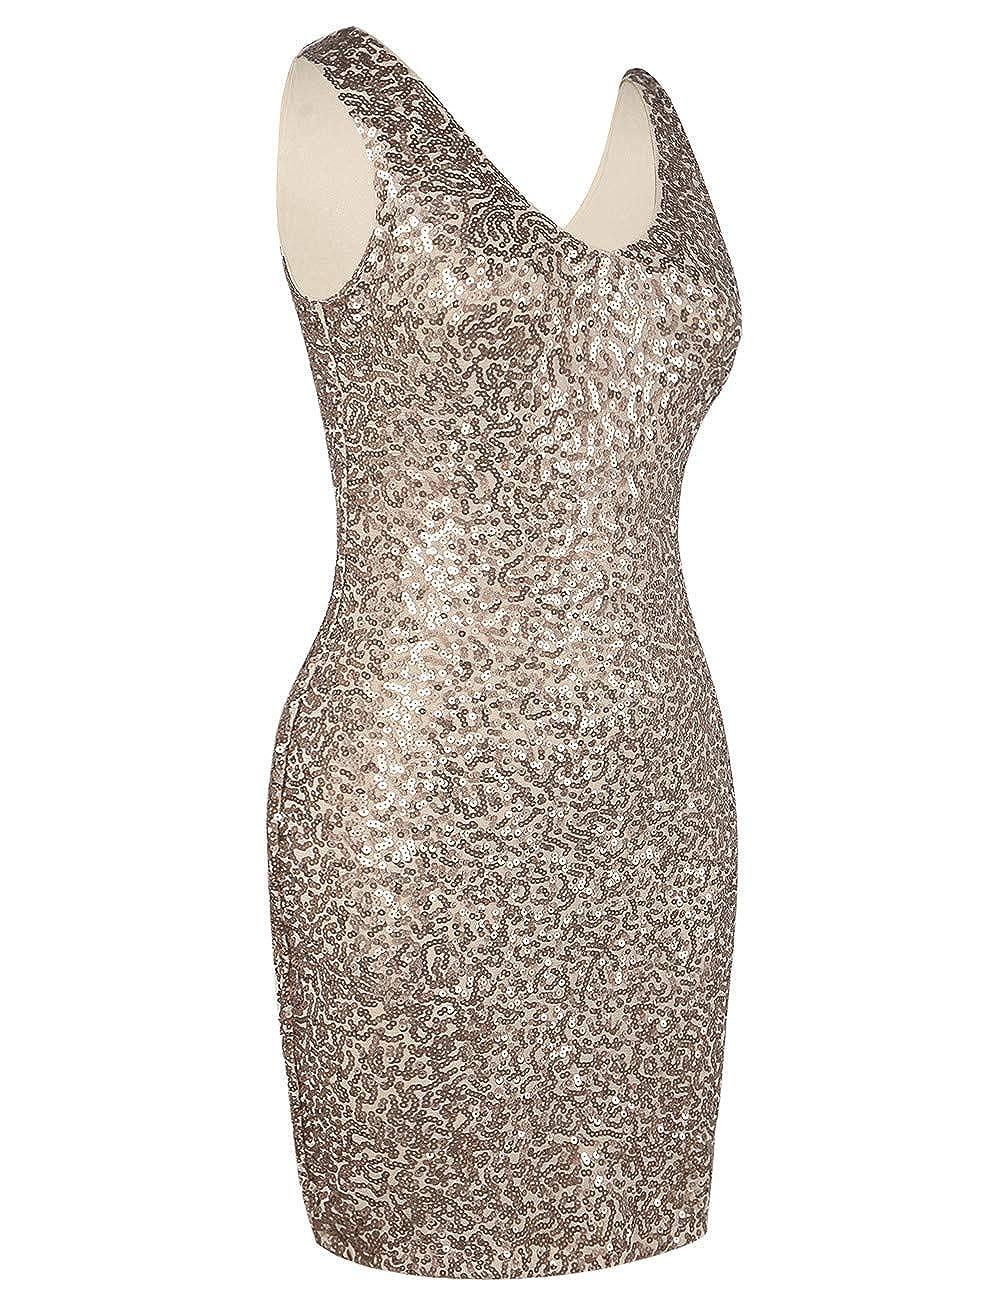 kayamiya Womens Sequin Cocktail Dress Sparkly V Neck Bodycon Party Dress Club Nightout